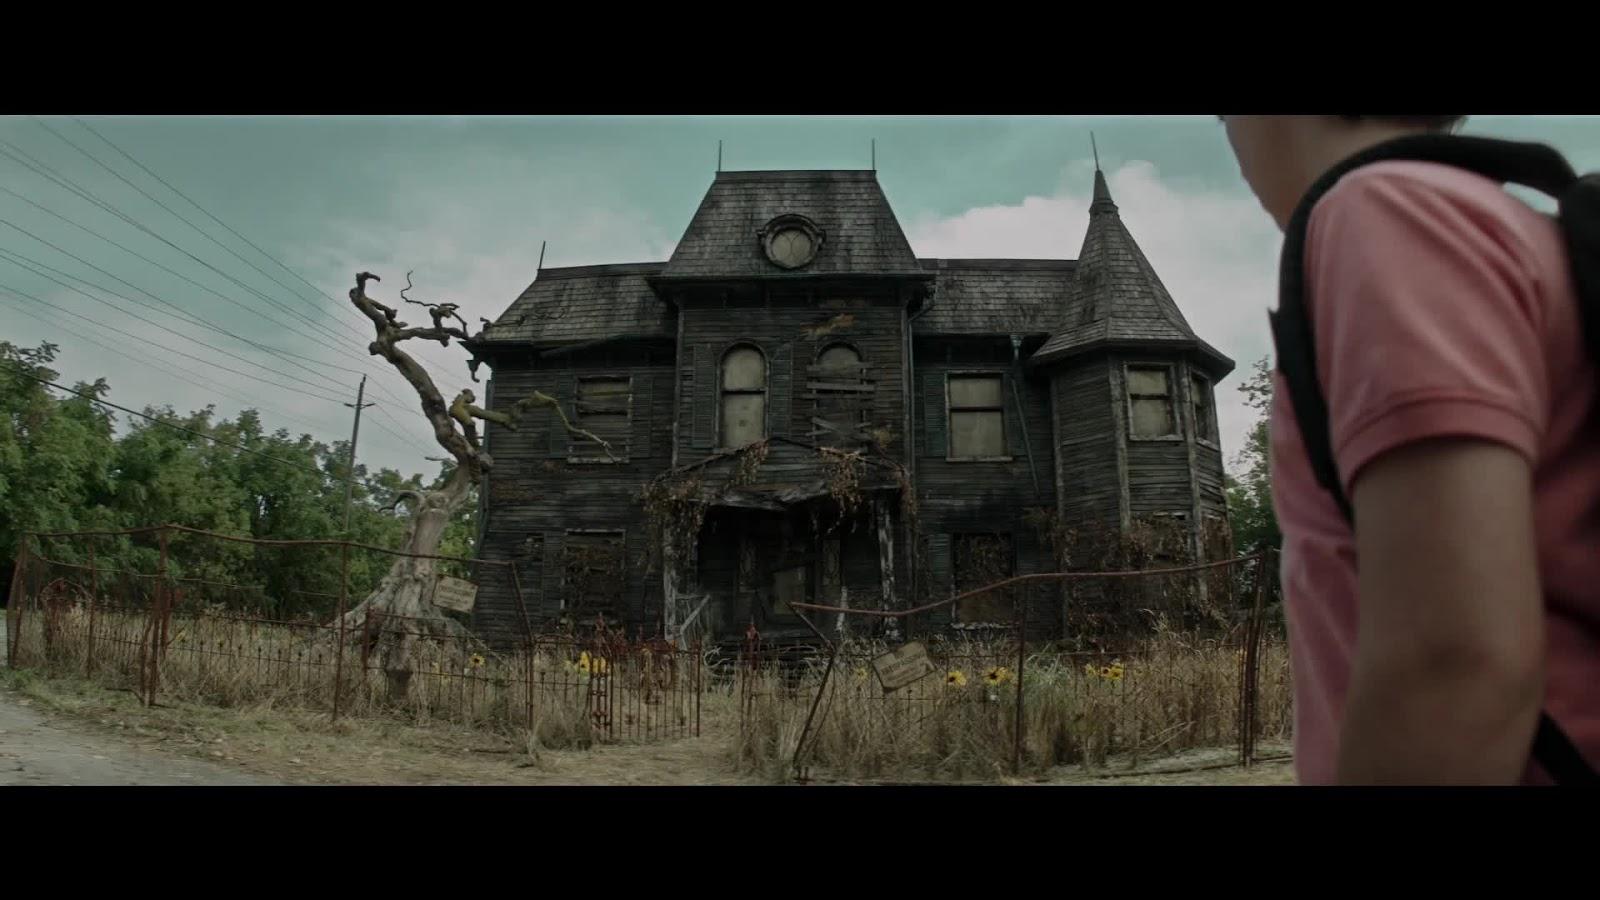 film horor terbaru it 2017 teror hantu badut full movie